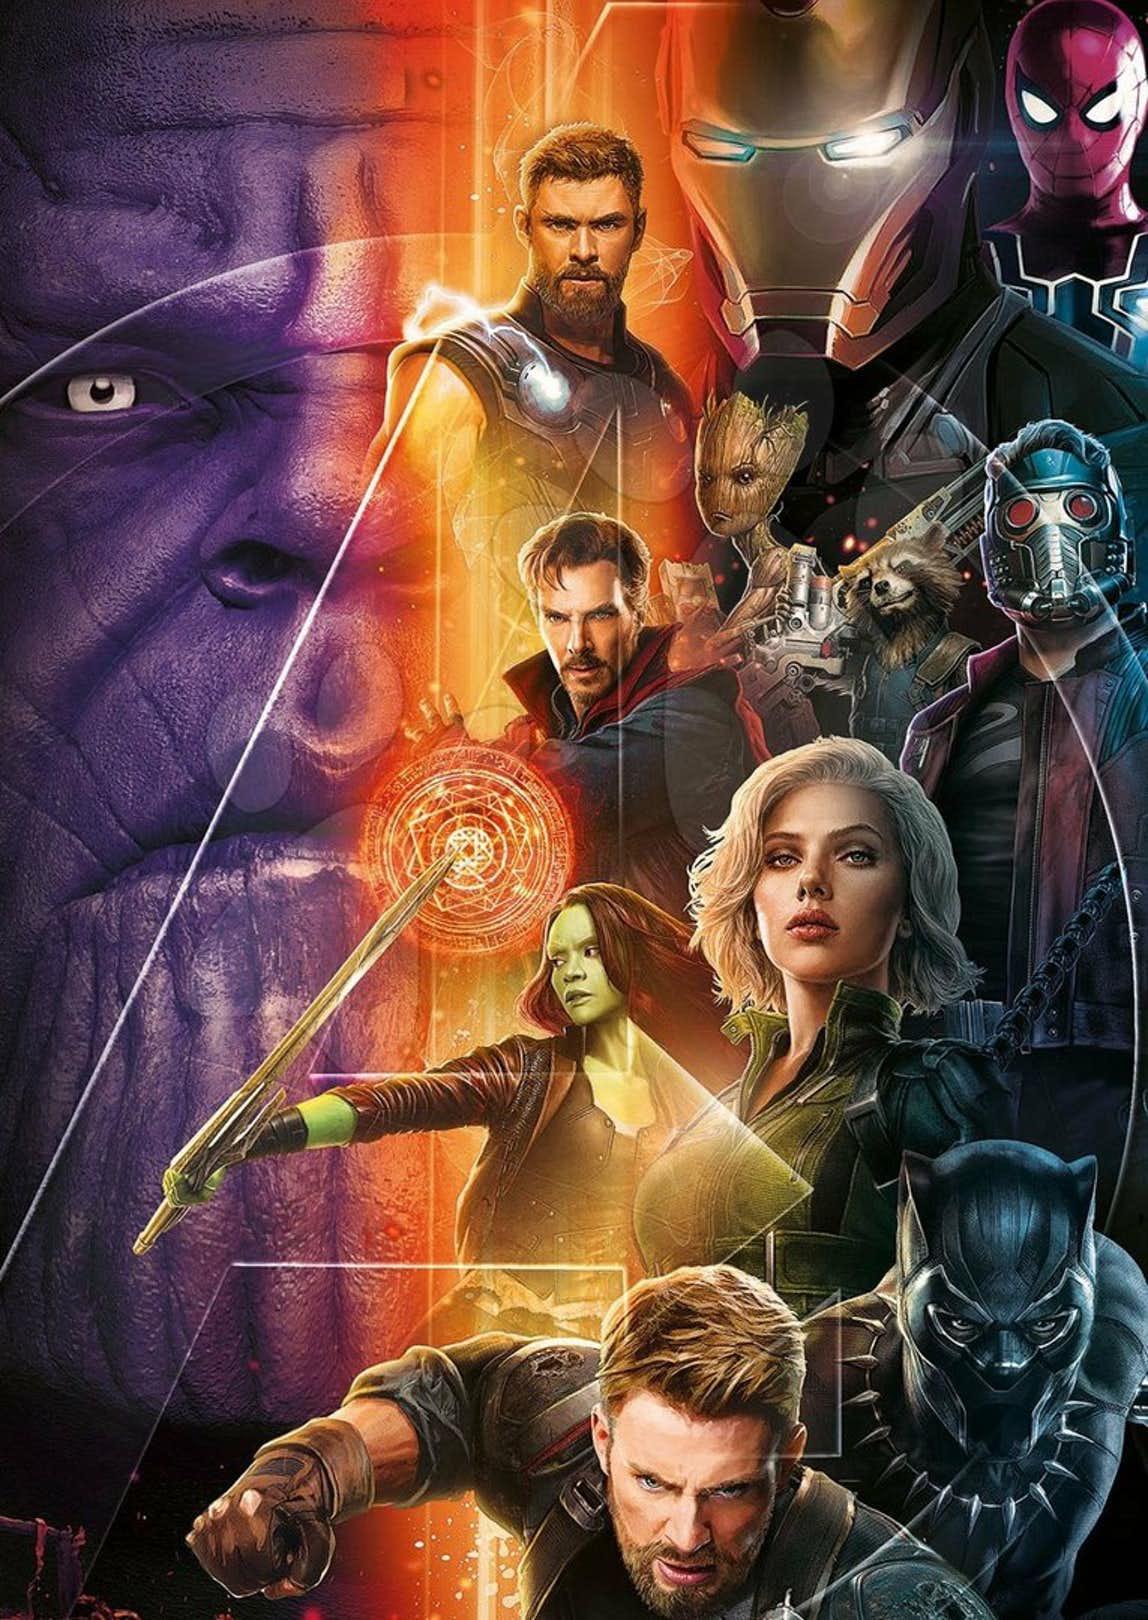 De Y WarAtomix Un AvengersInfinity Nuevo Genial Póster W9EeDH2IY